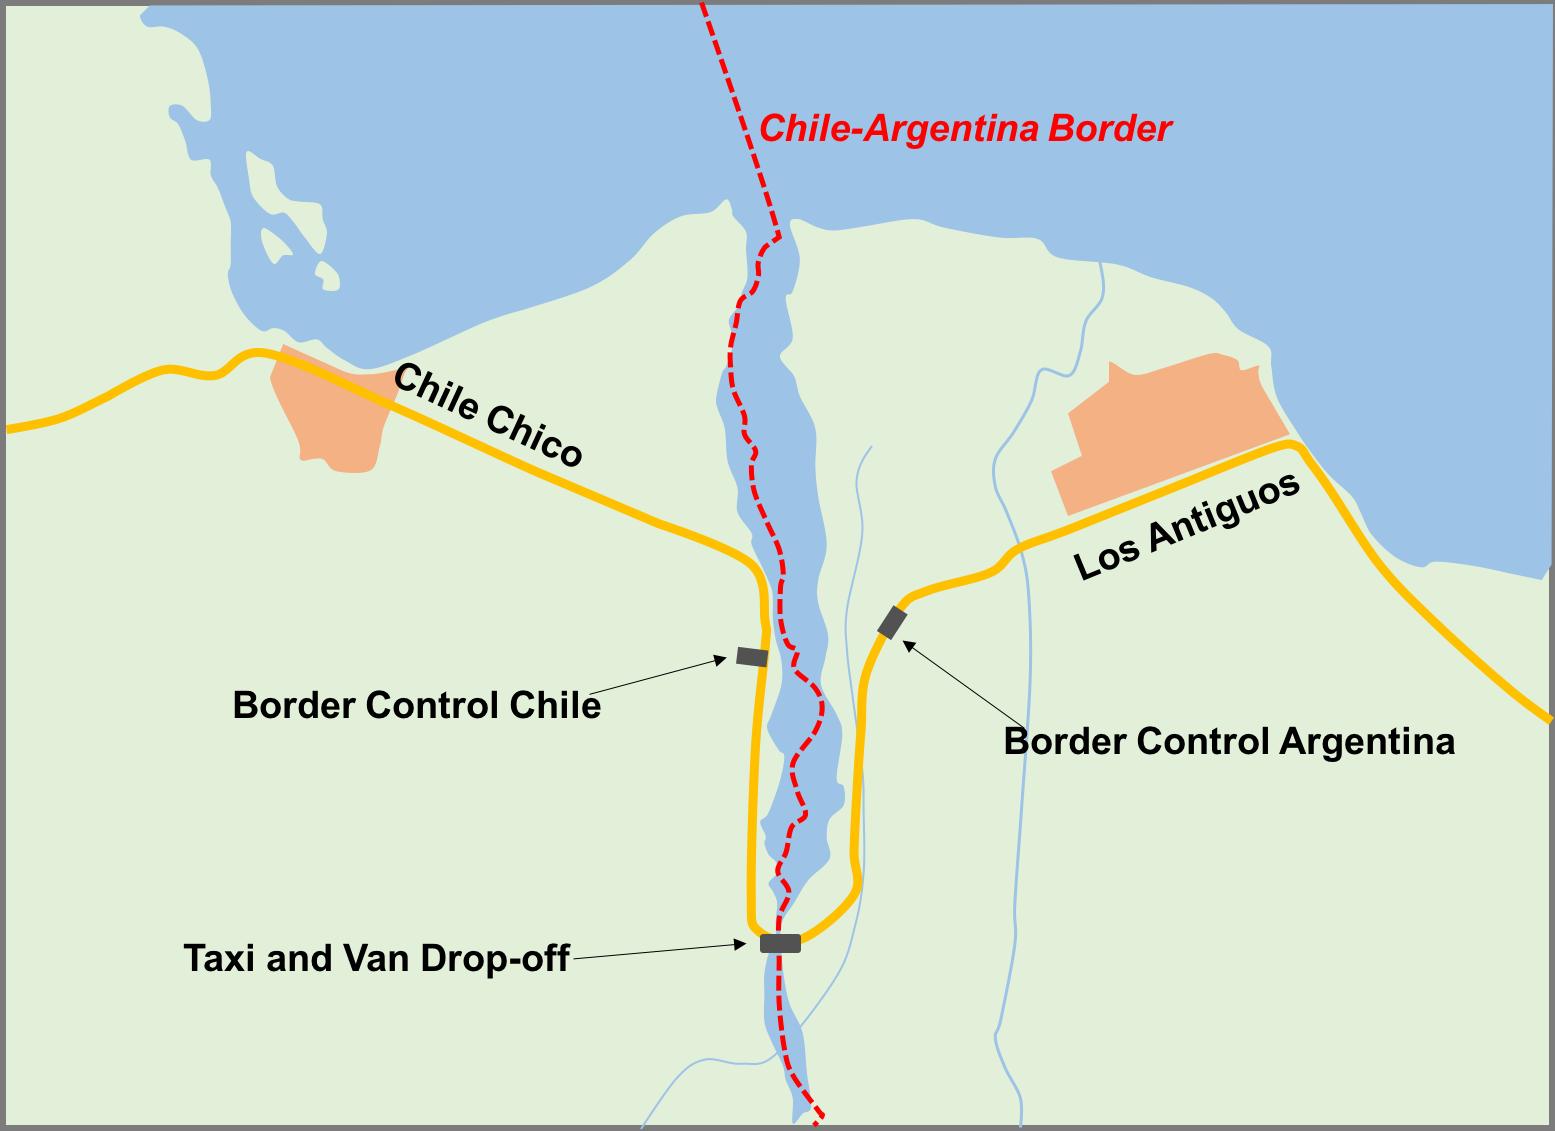 Border crossing basics.